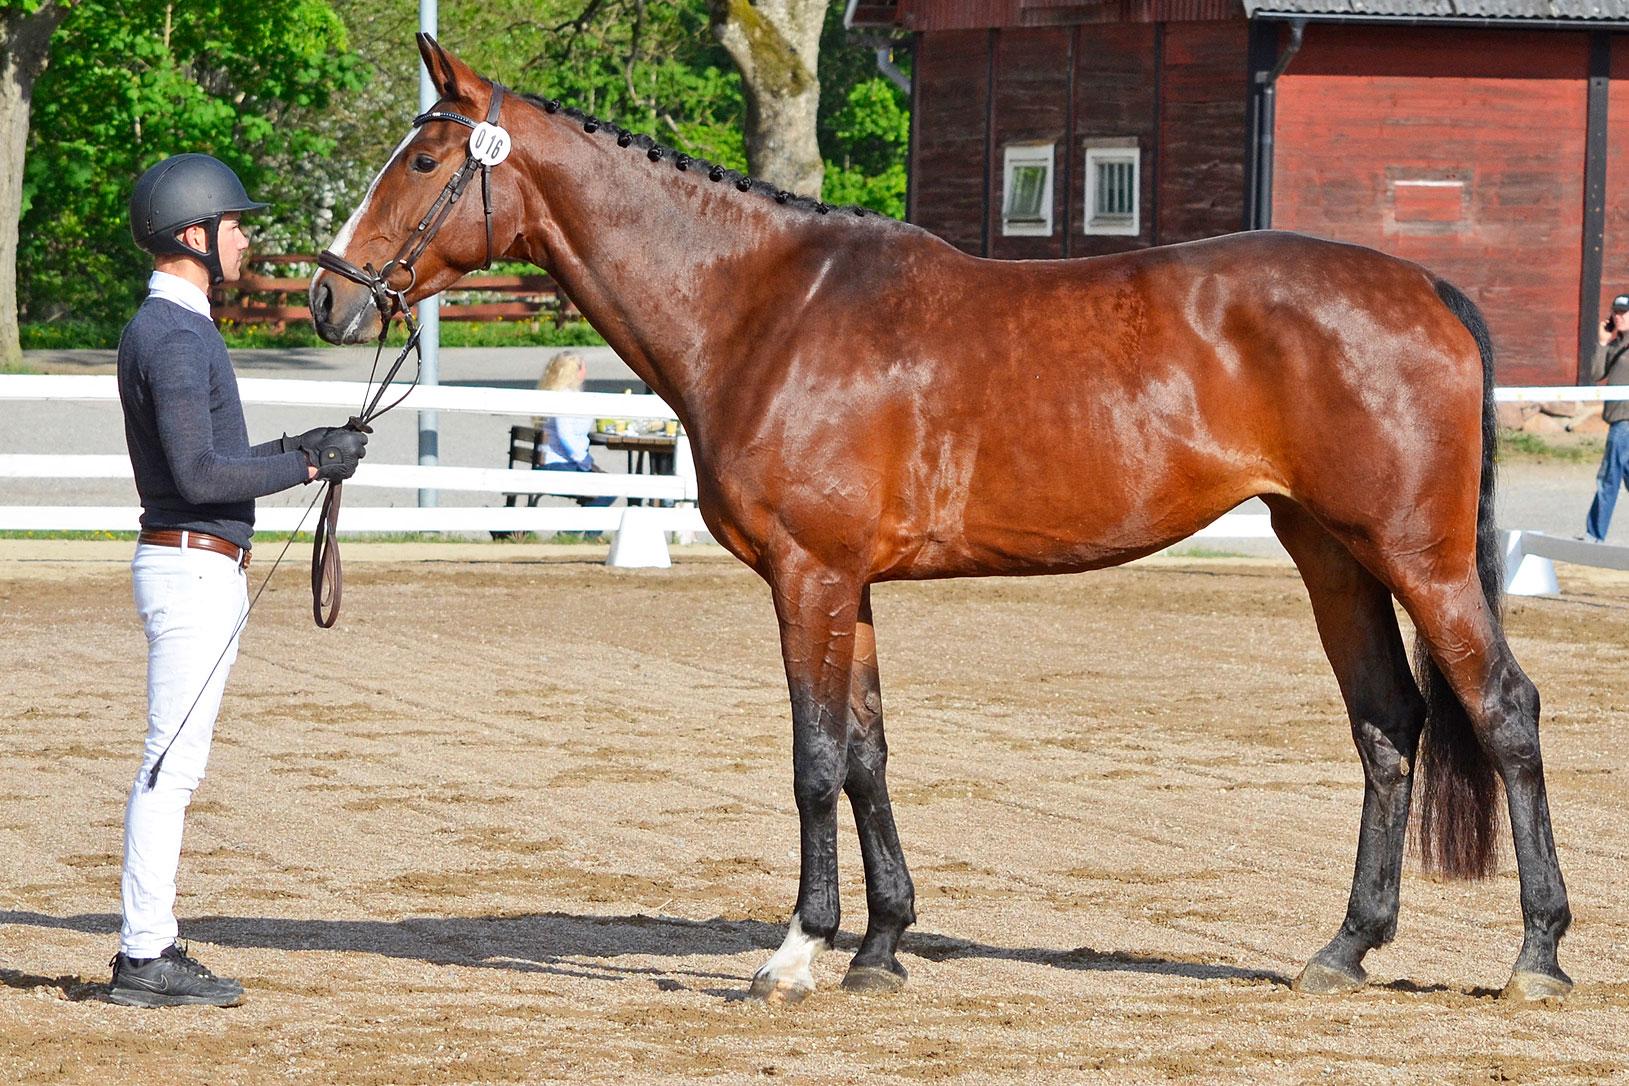 Uva Hästak (fölsto) SWB sto 171 cm e Toulouse u Qlippa Hästak e Cosmeo, uppf/äg Hästak AB. (7,5 7,5 9 8) = 80,8% diplom C